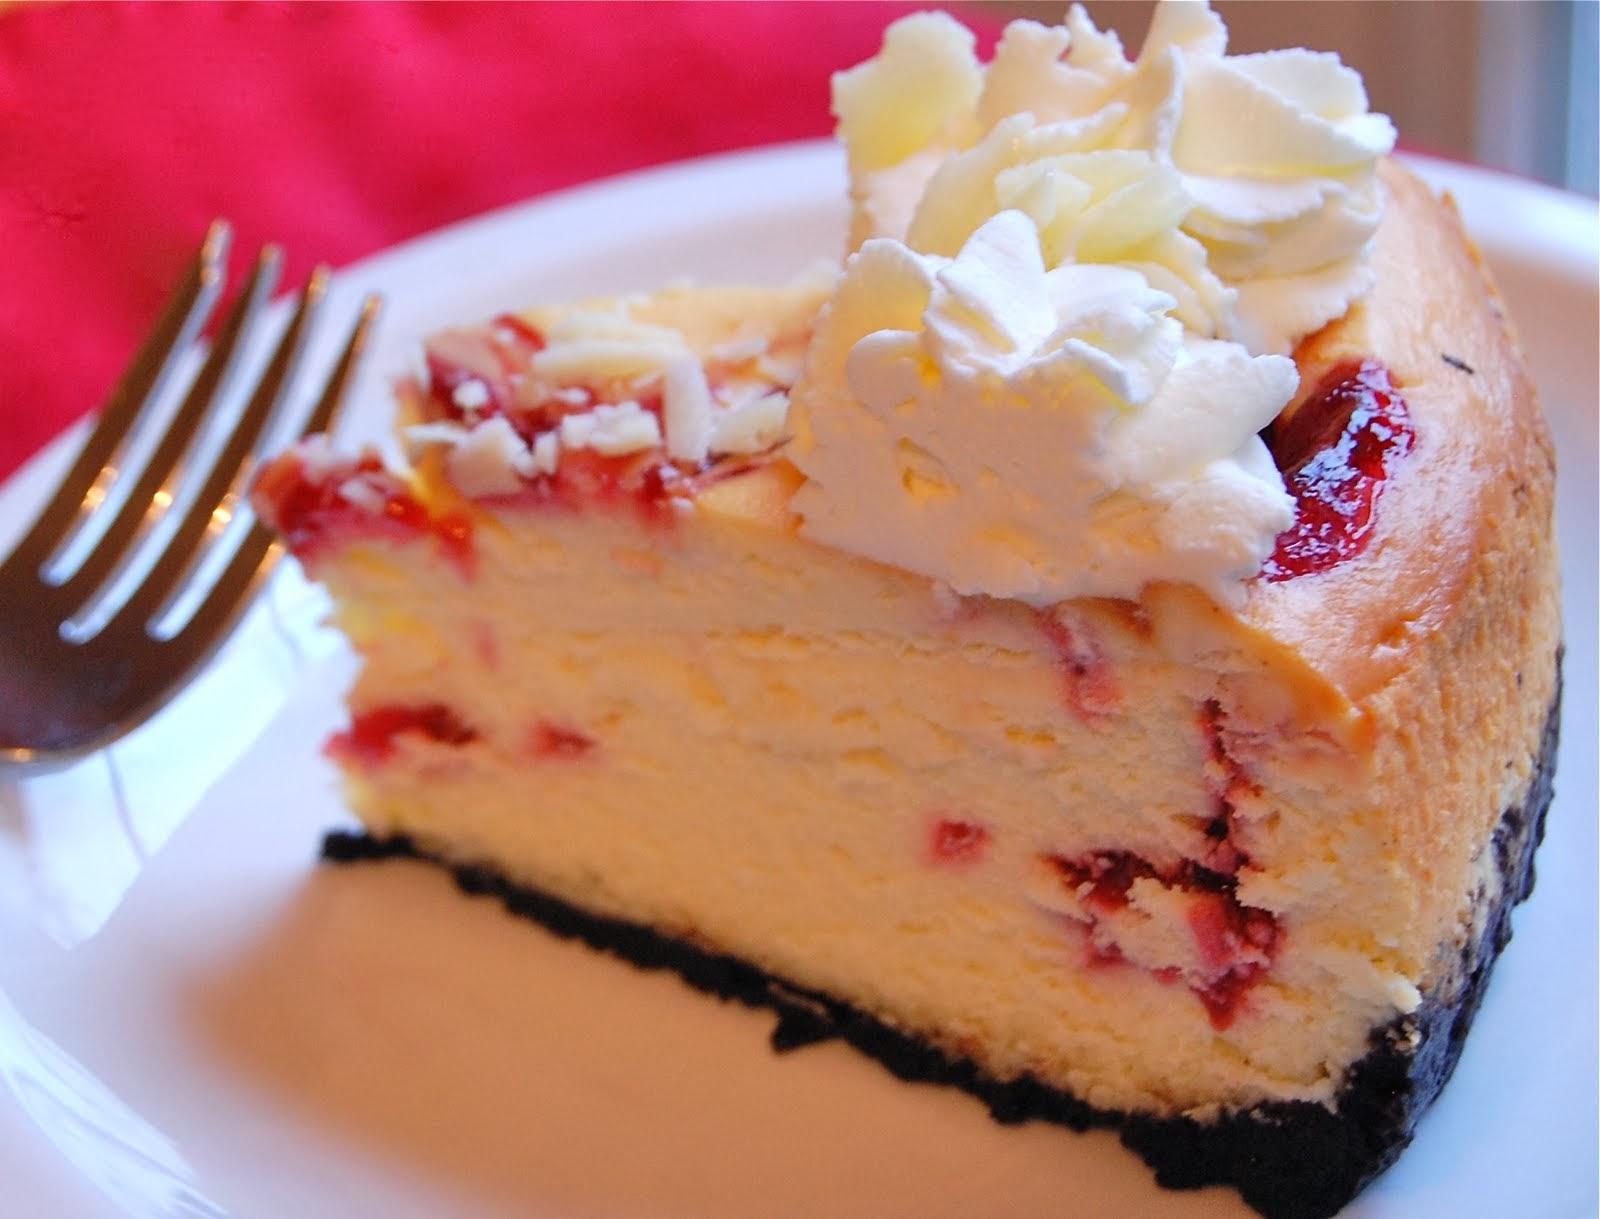 http://4.bp.blogspot.com/_NuRJQkqRb-k/TUhl7J5BTnI/AAAAAAAAAGo/QgJfsCqtGJc/s1600/white+chocolate+raspberry+truffle+cheesecake.JPG